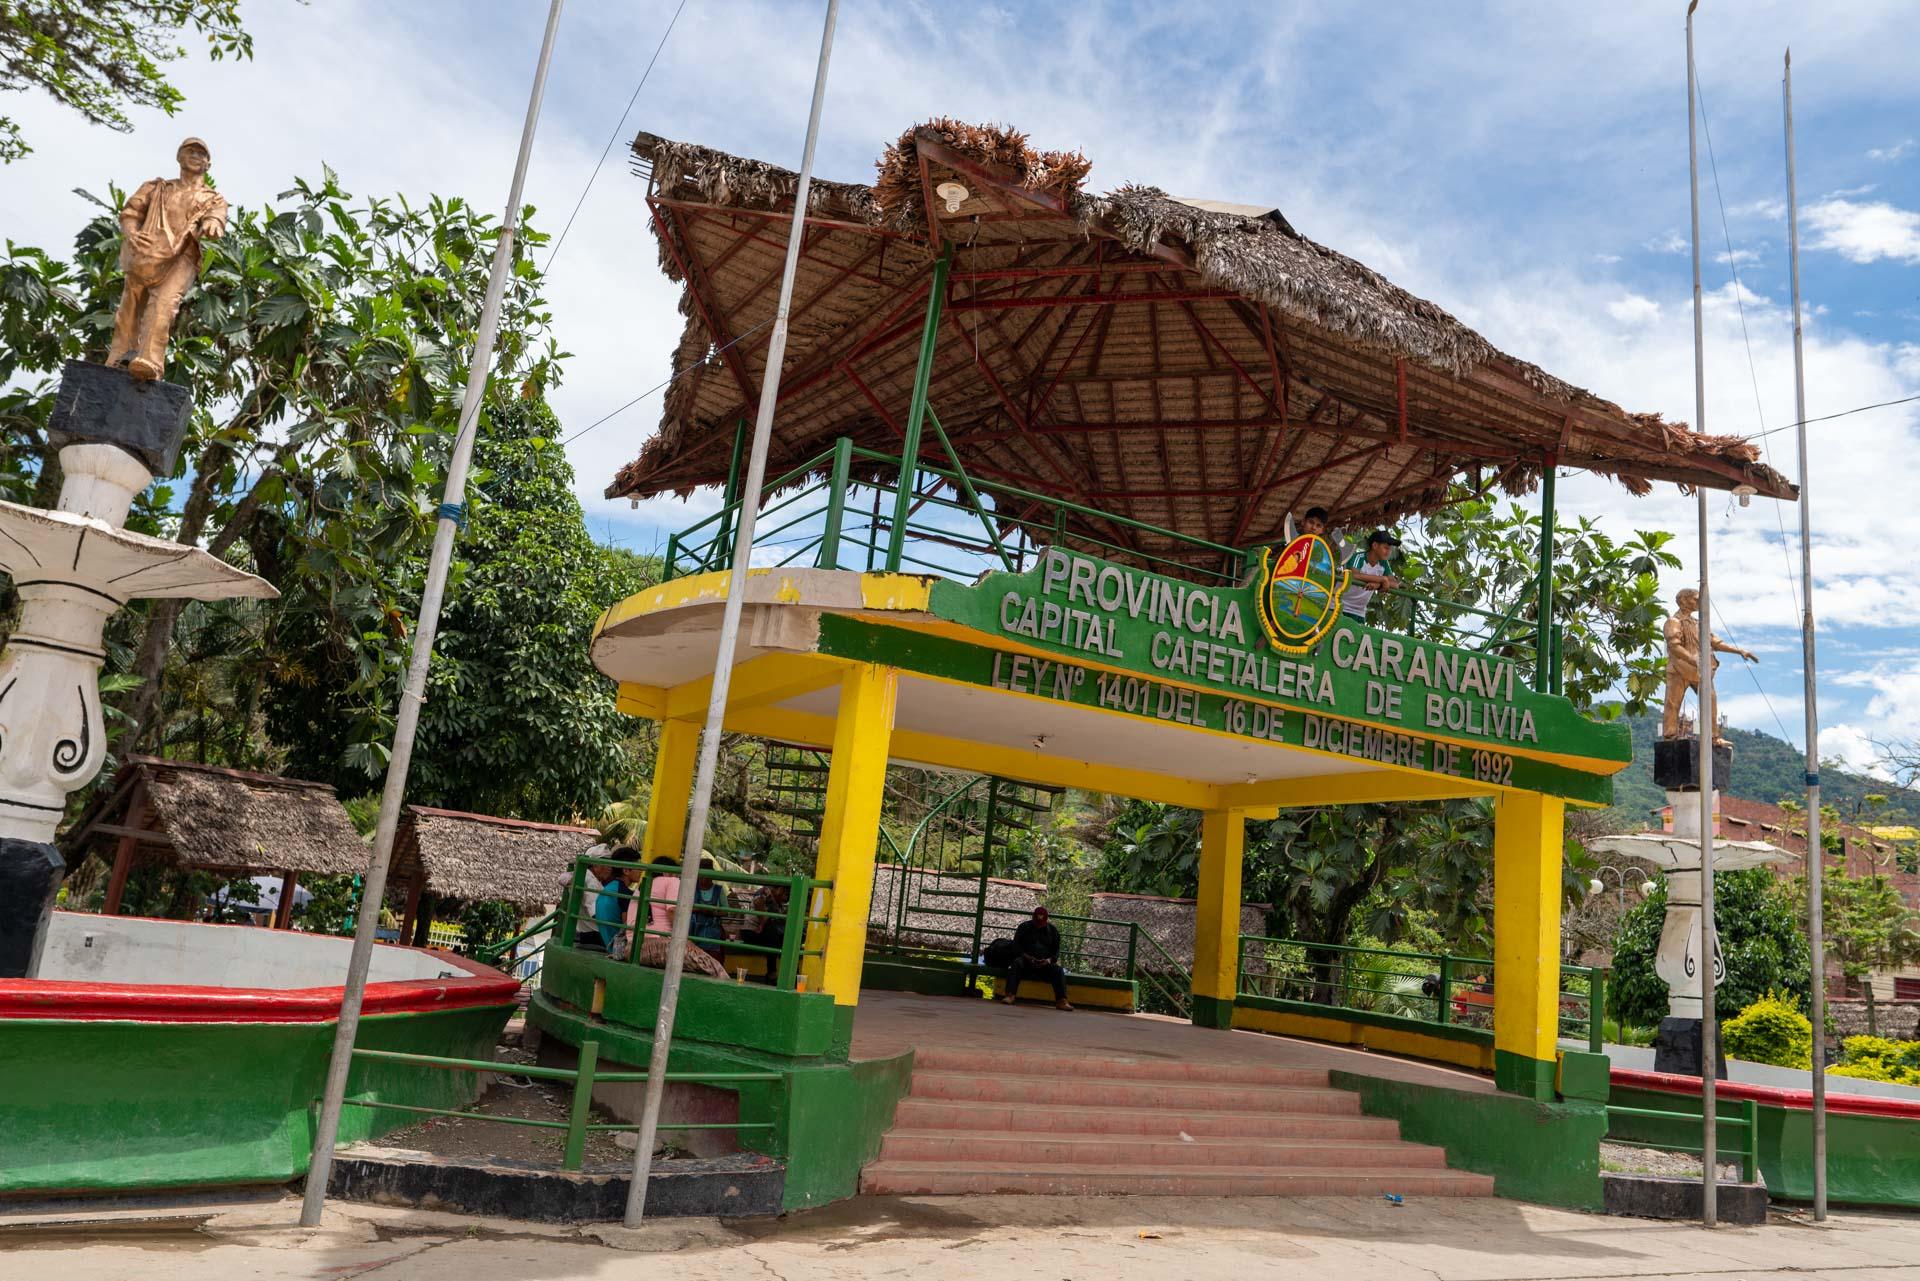 Bienvenue à Caranavi Capitale du café